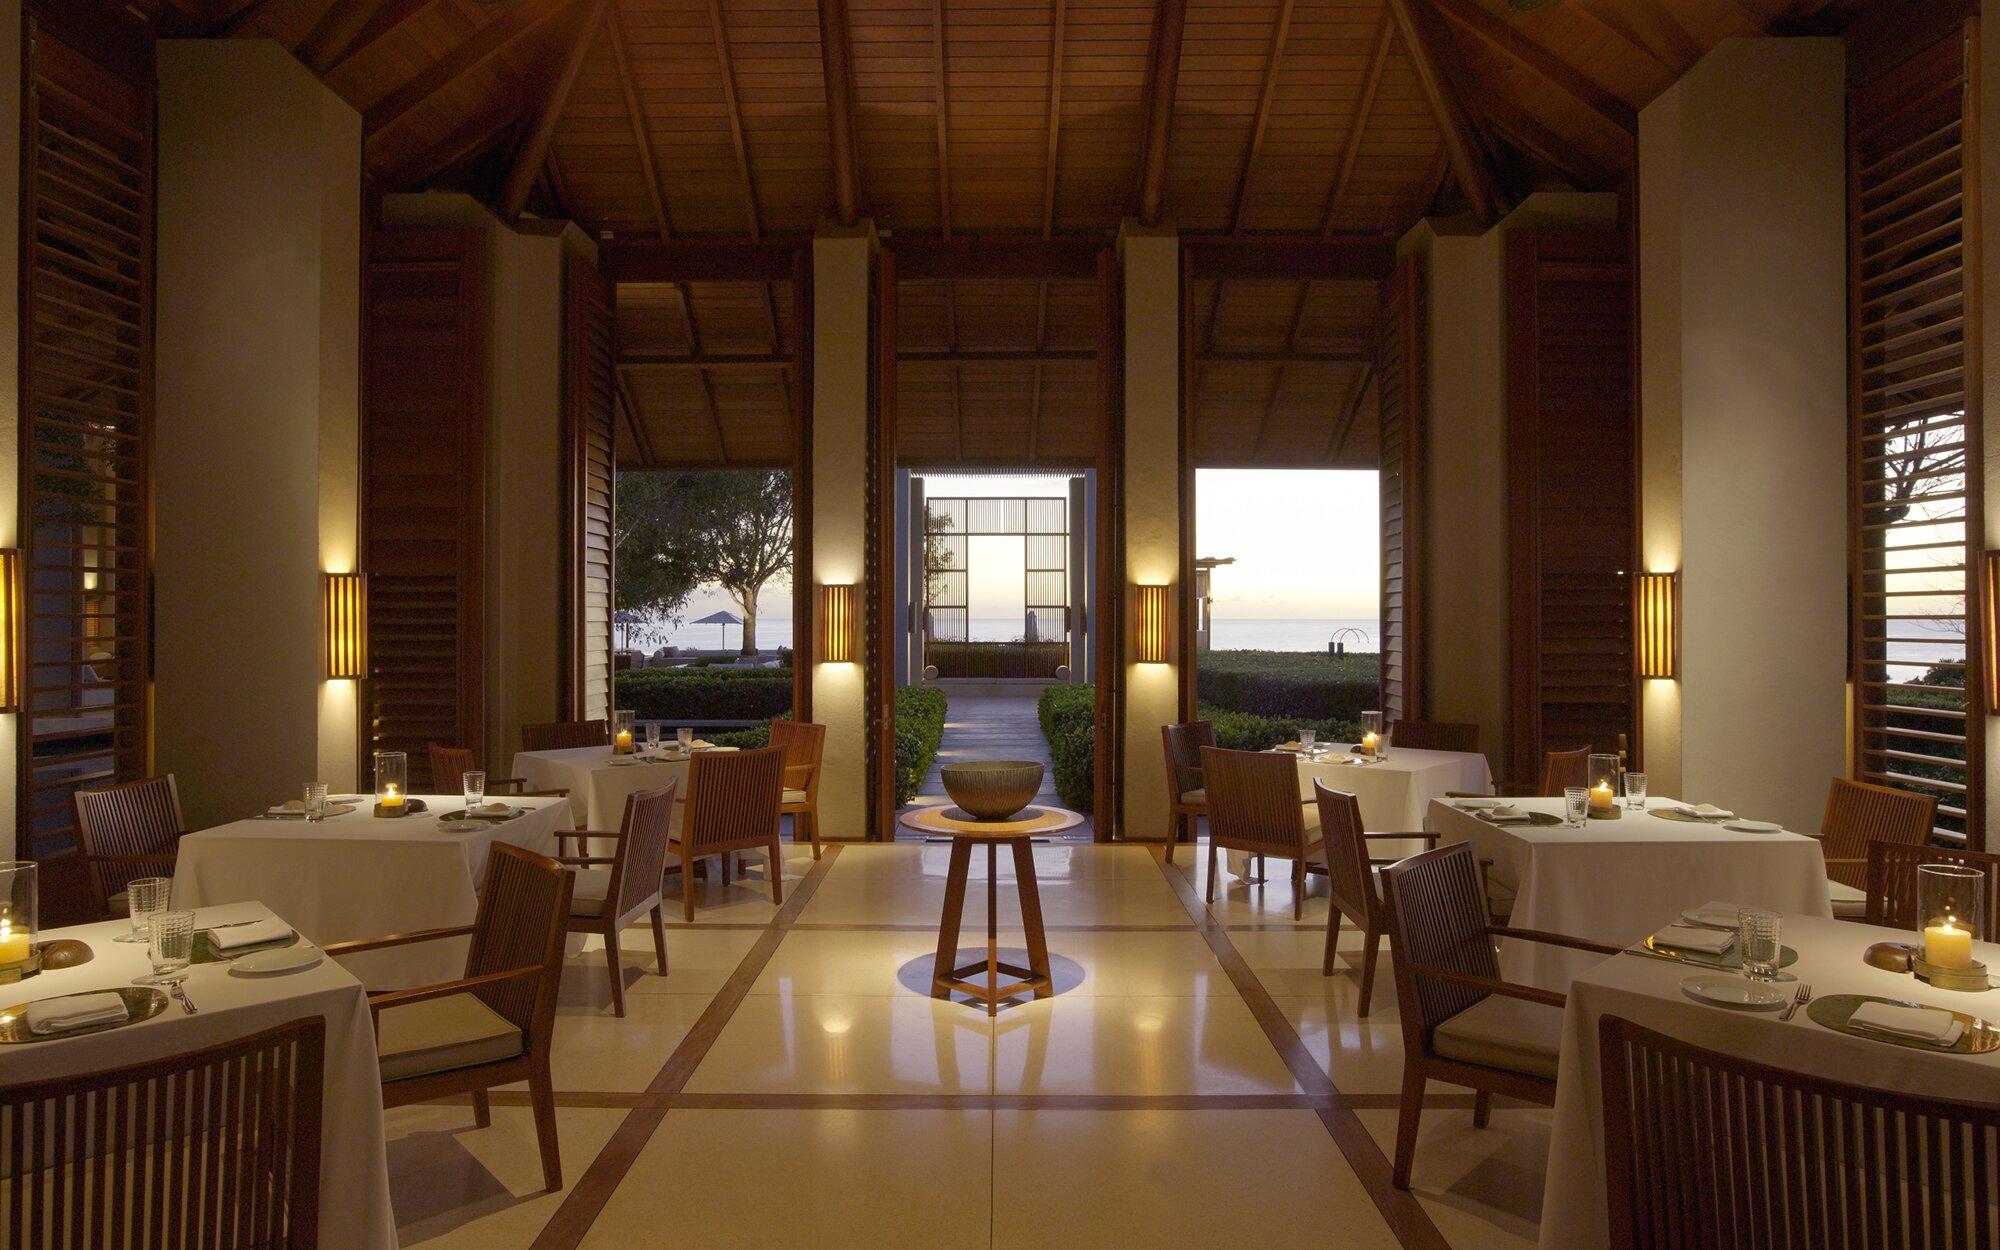 Amanyara restaurant inside view